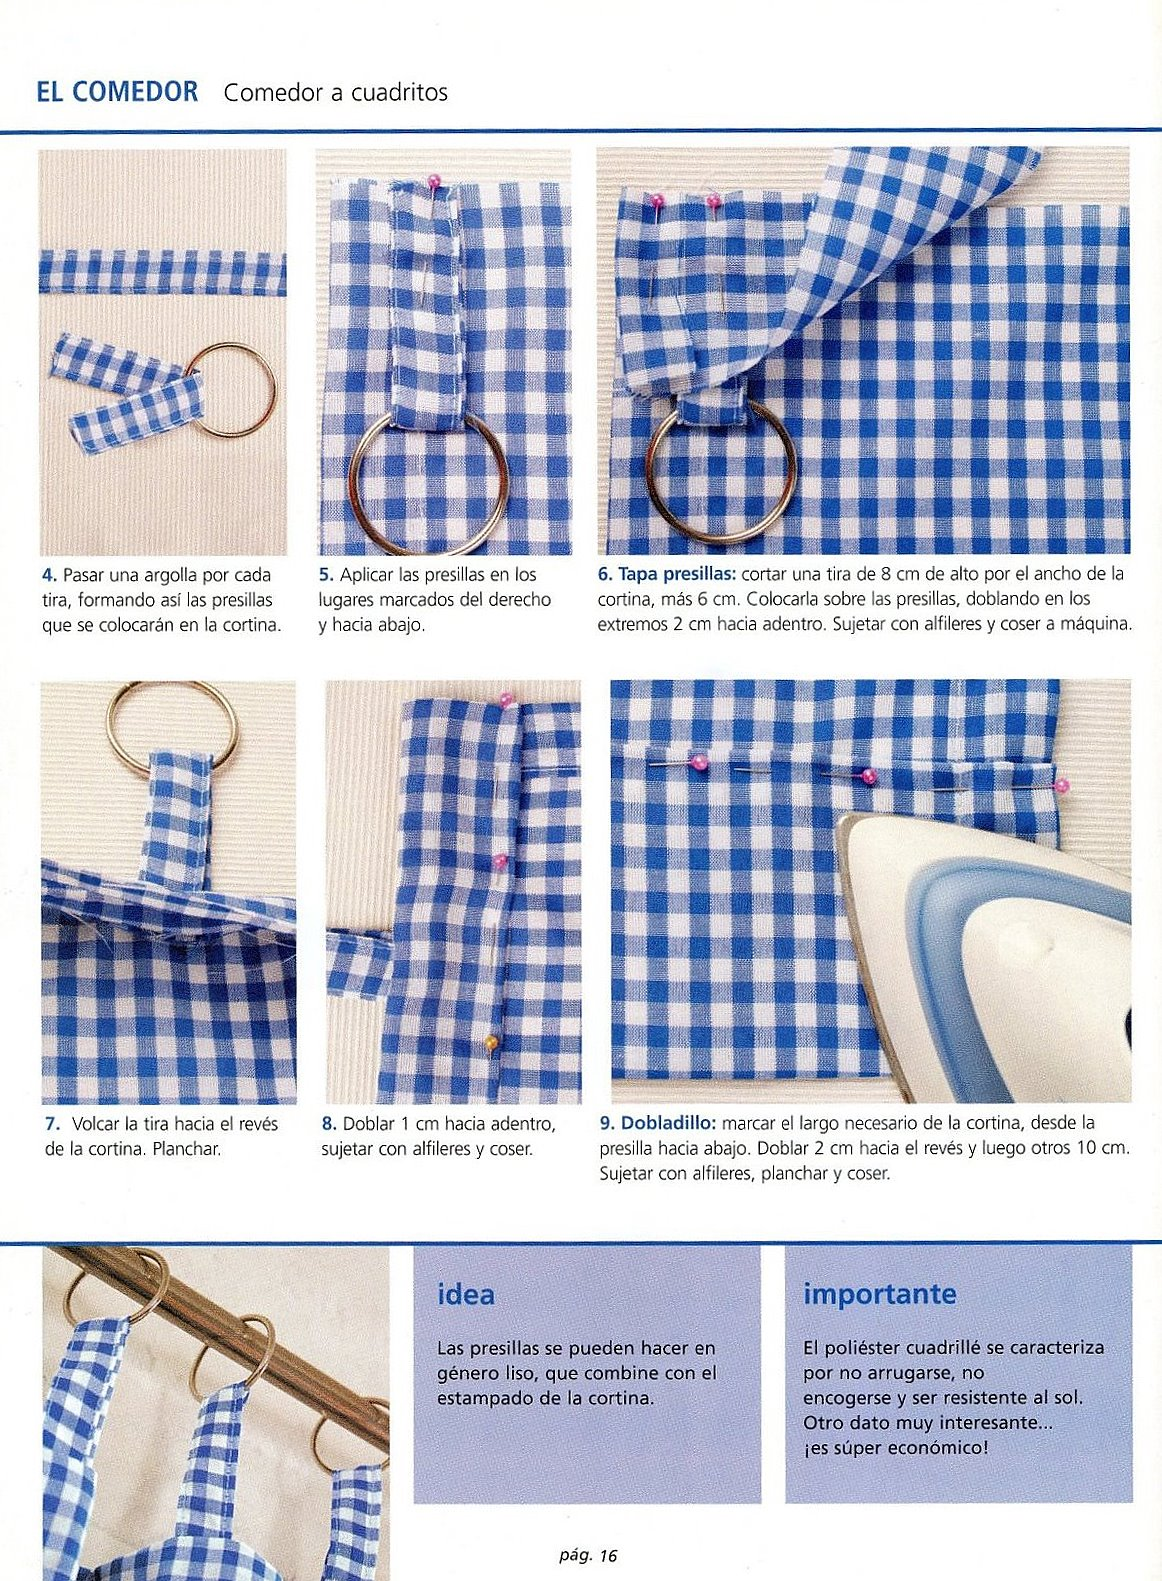 Pin manualidades para tu cocina pelautscom on pinterest - Cortinas para comedor ...